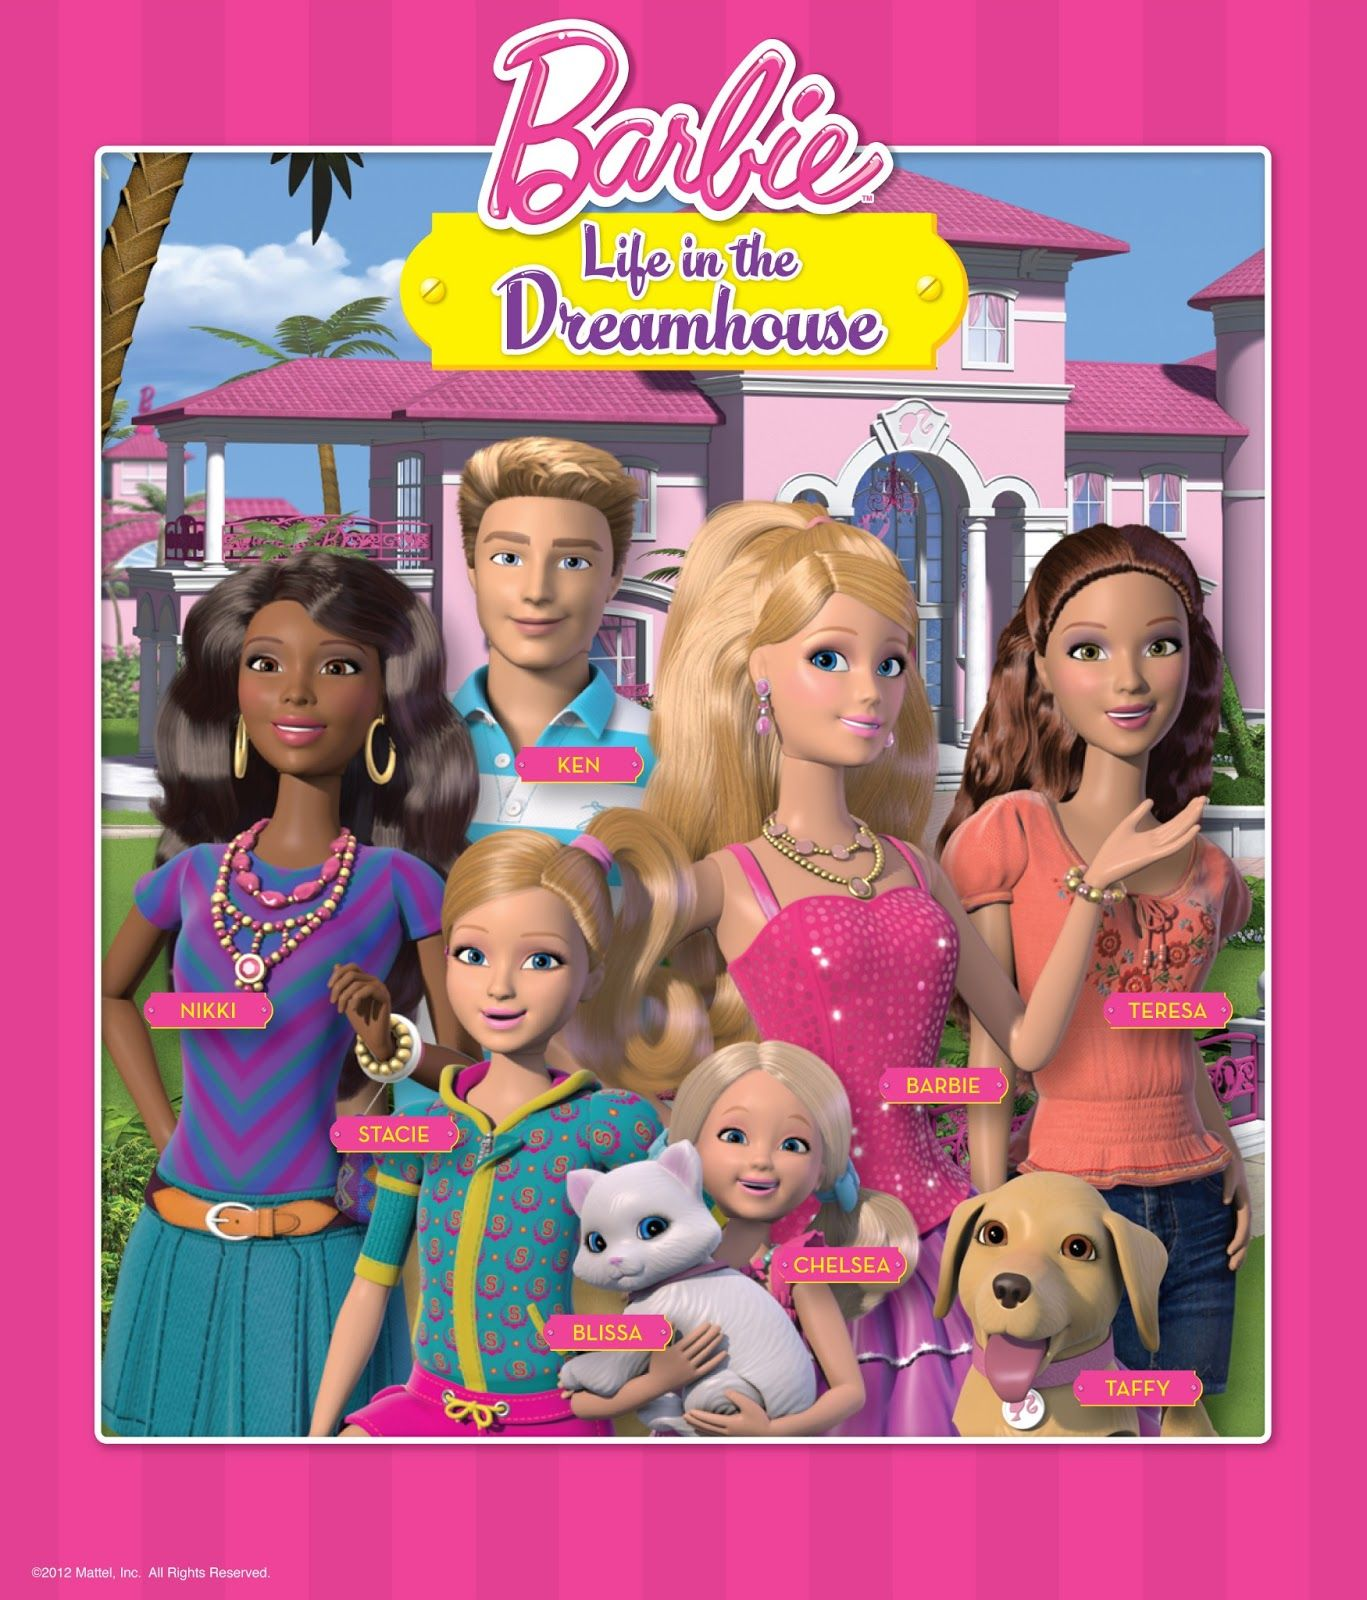 Barbie Dream House Google Search Barbie Life Barbie Sisters Barbie